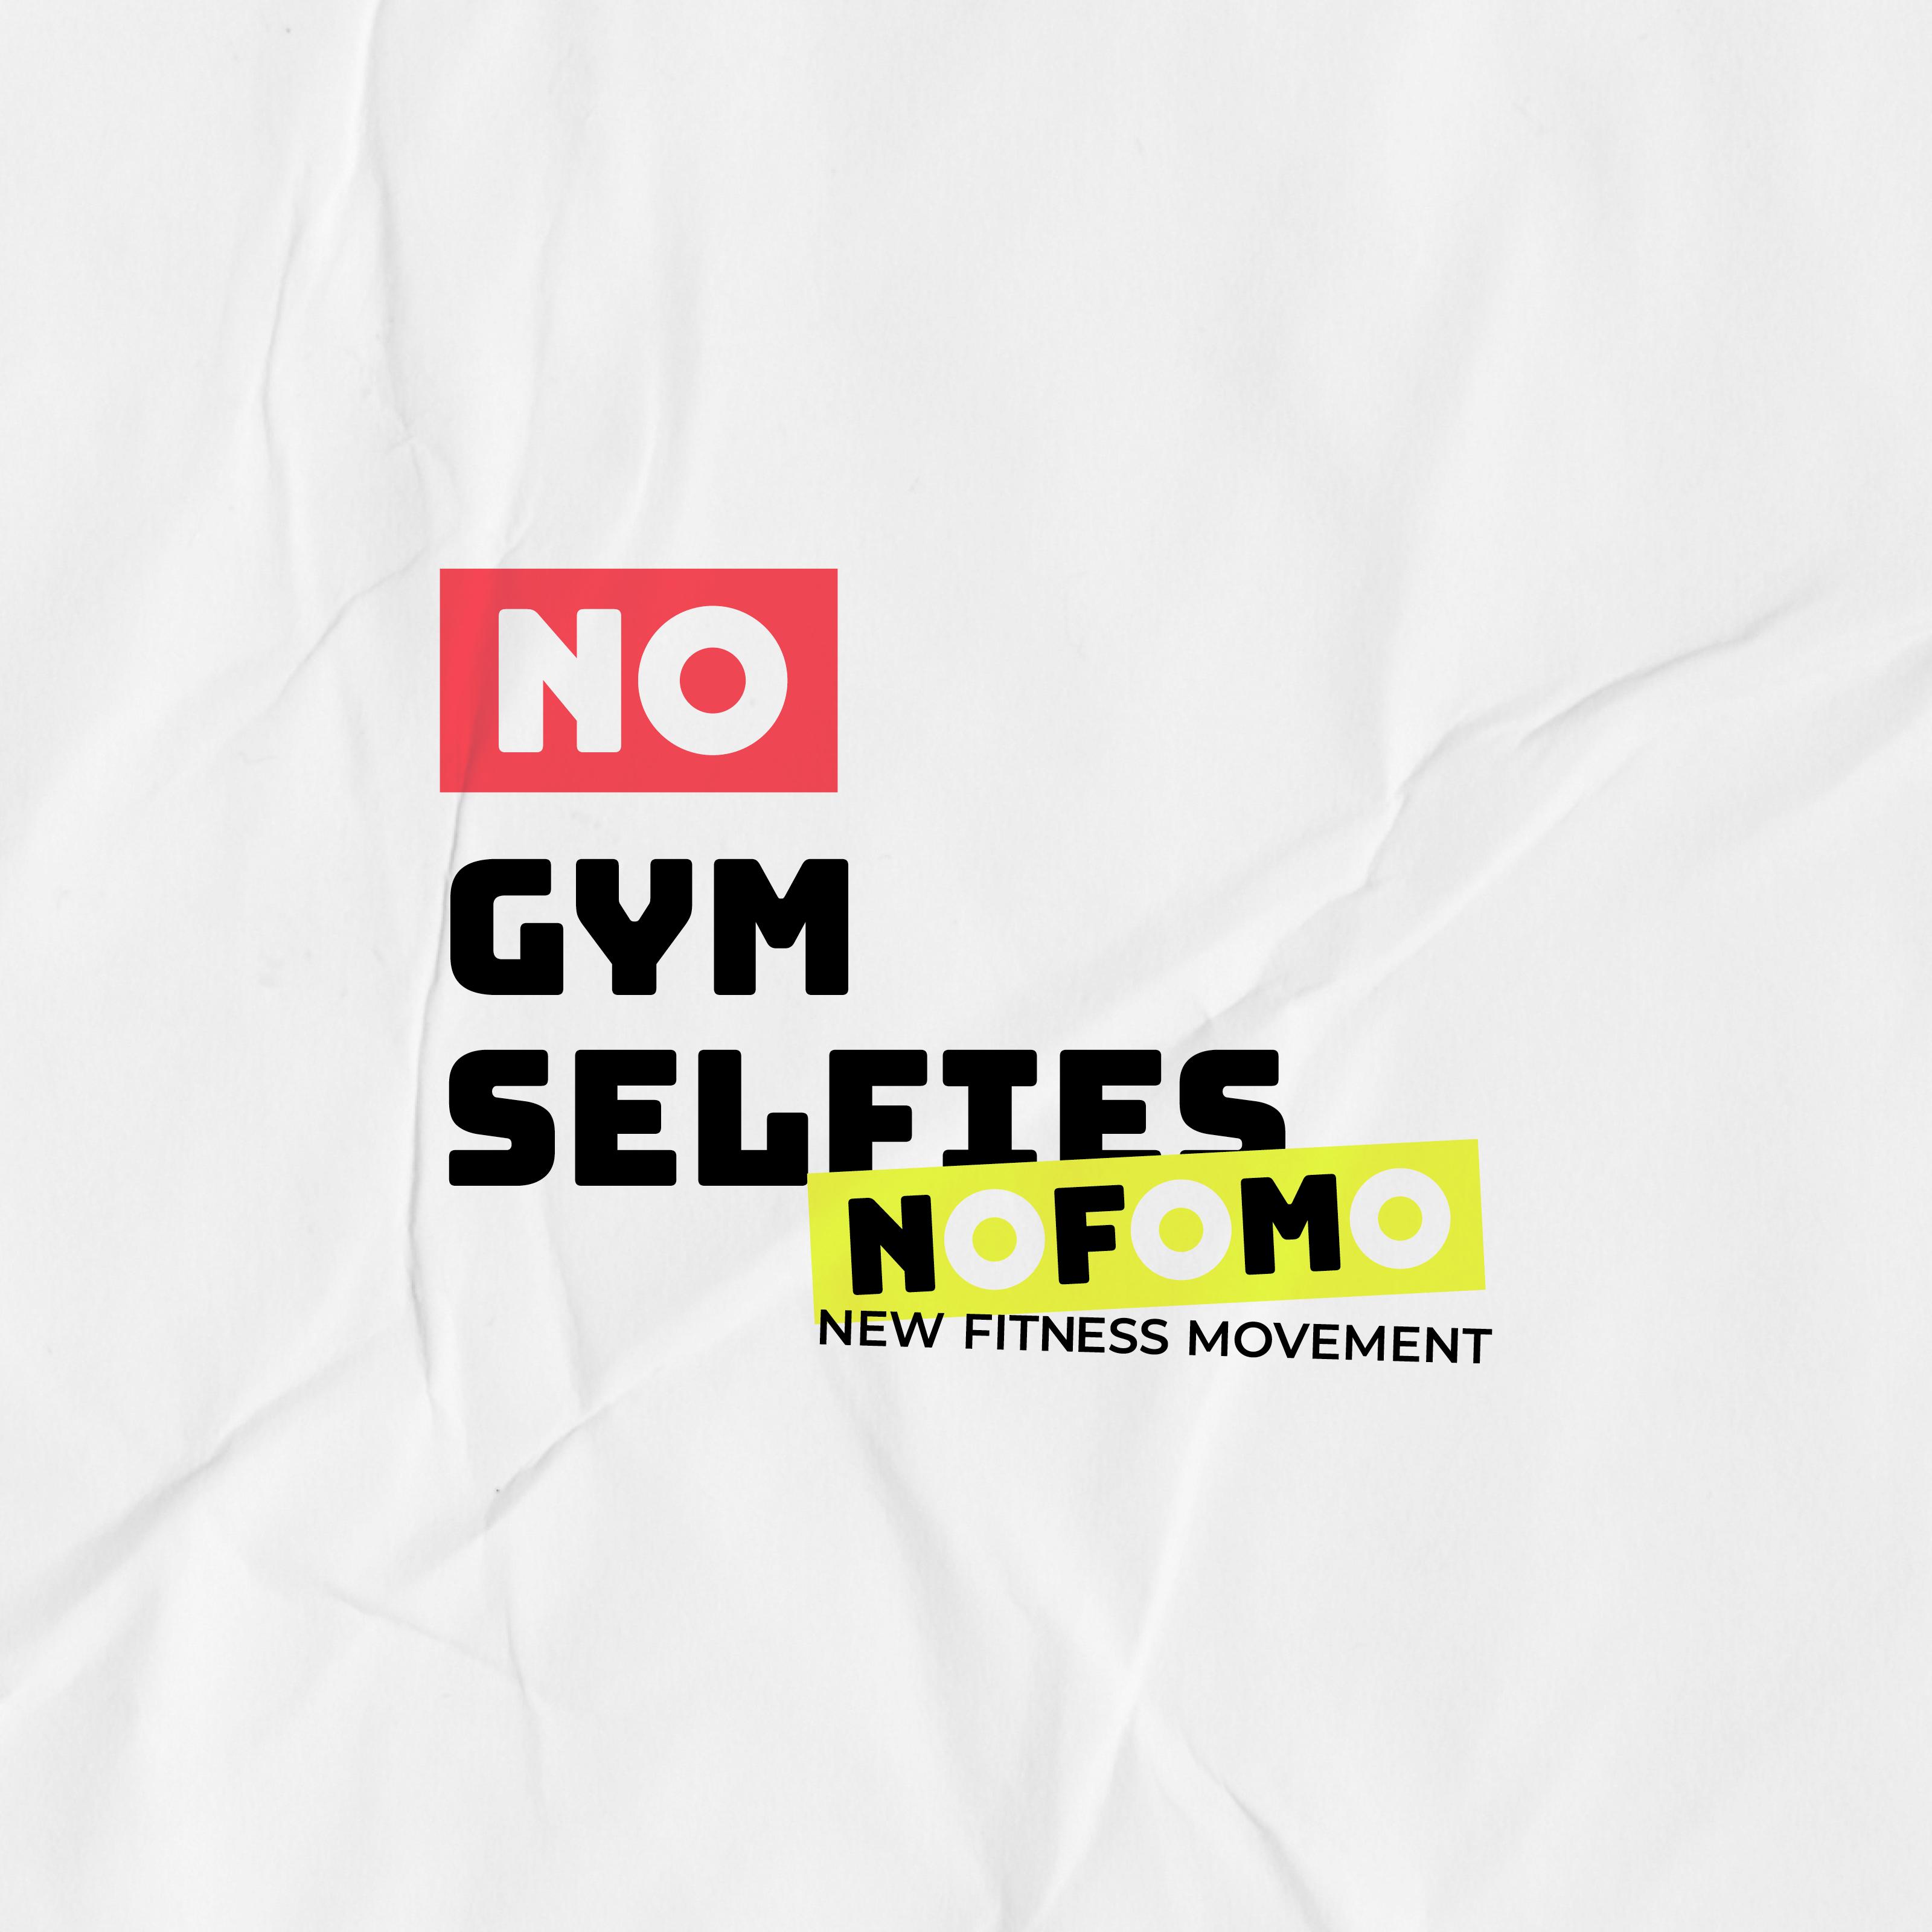 NOFOMO Branding example